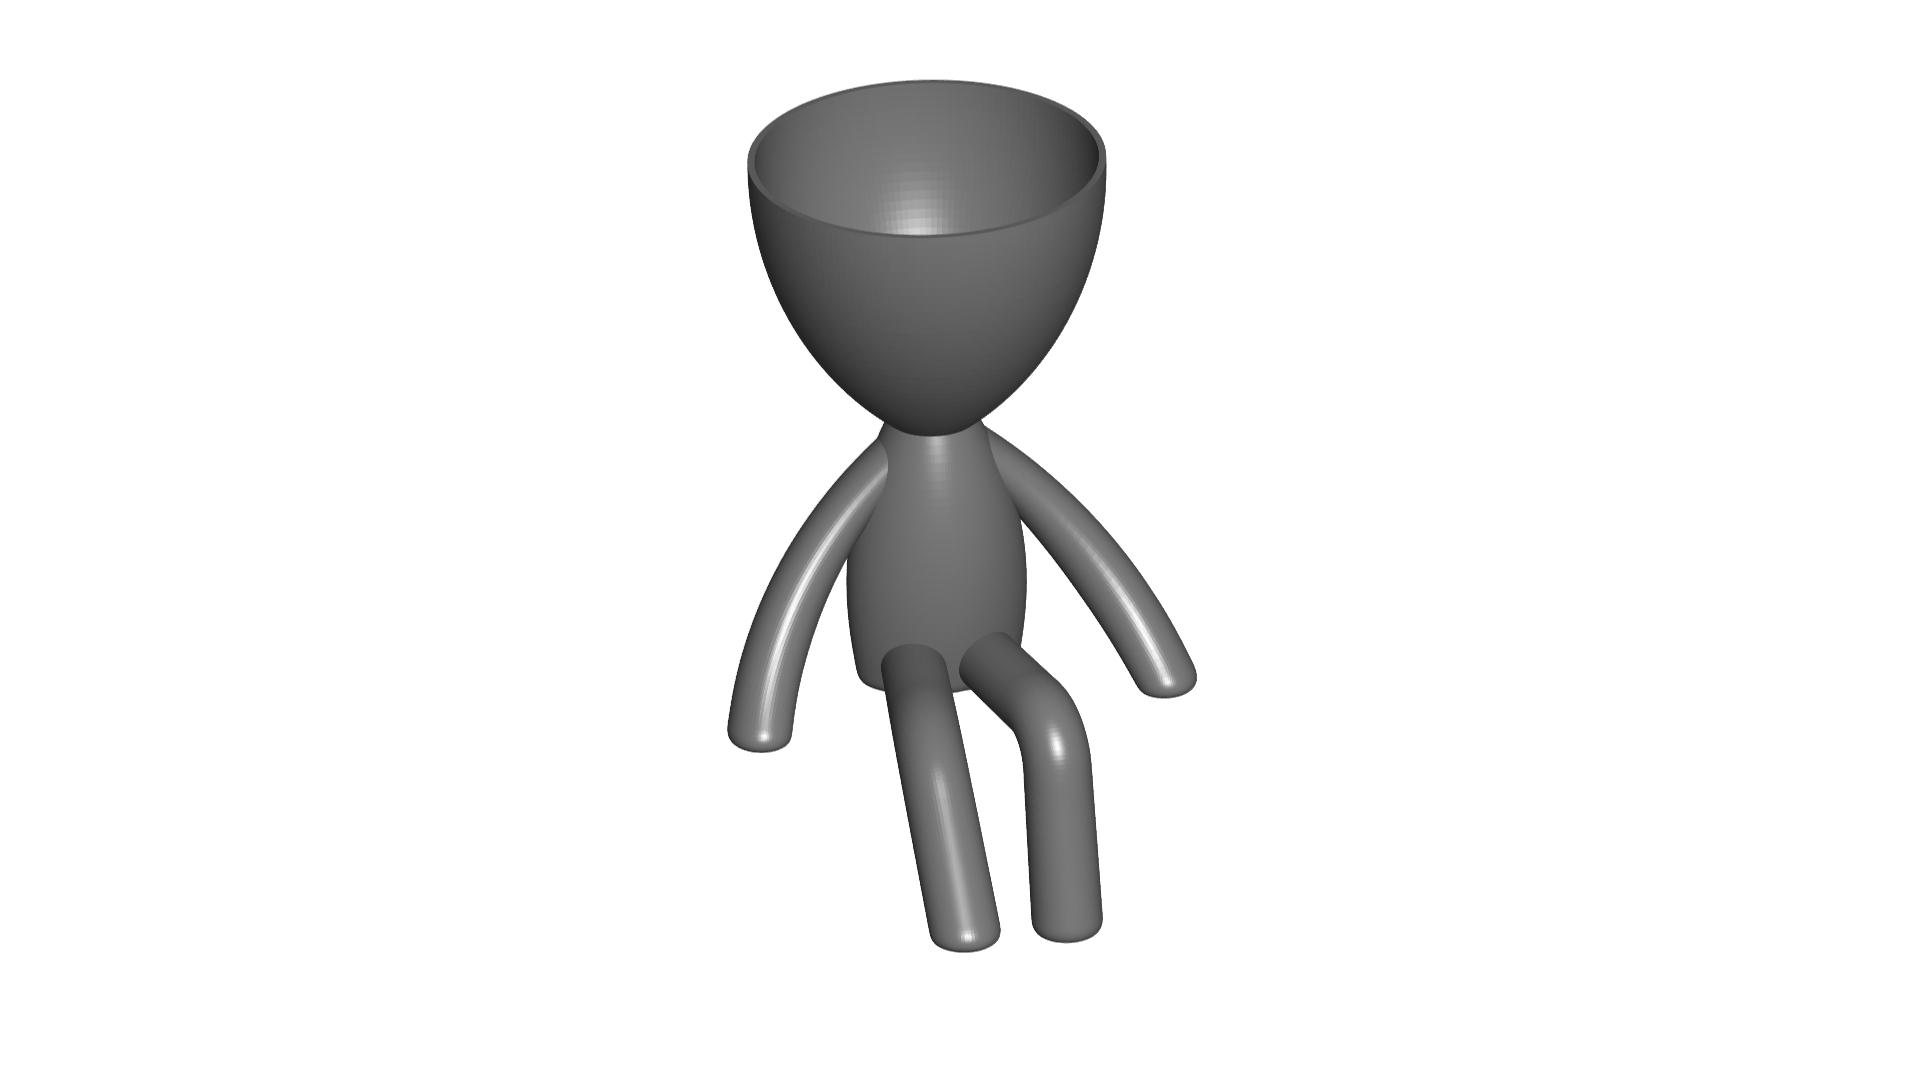 Vaso_105_Gris_1.jpg Download free STL file JARRÓN MACETA ROBERT 105 - VASE FLOWERPOT ROBERT 105 • Model to 3D print, PRODUSTL56